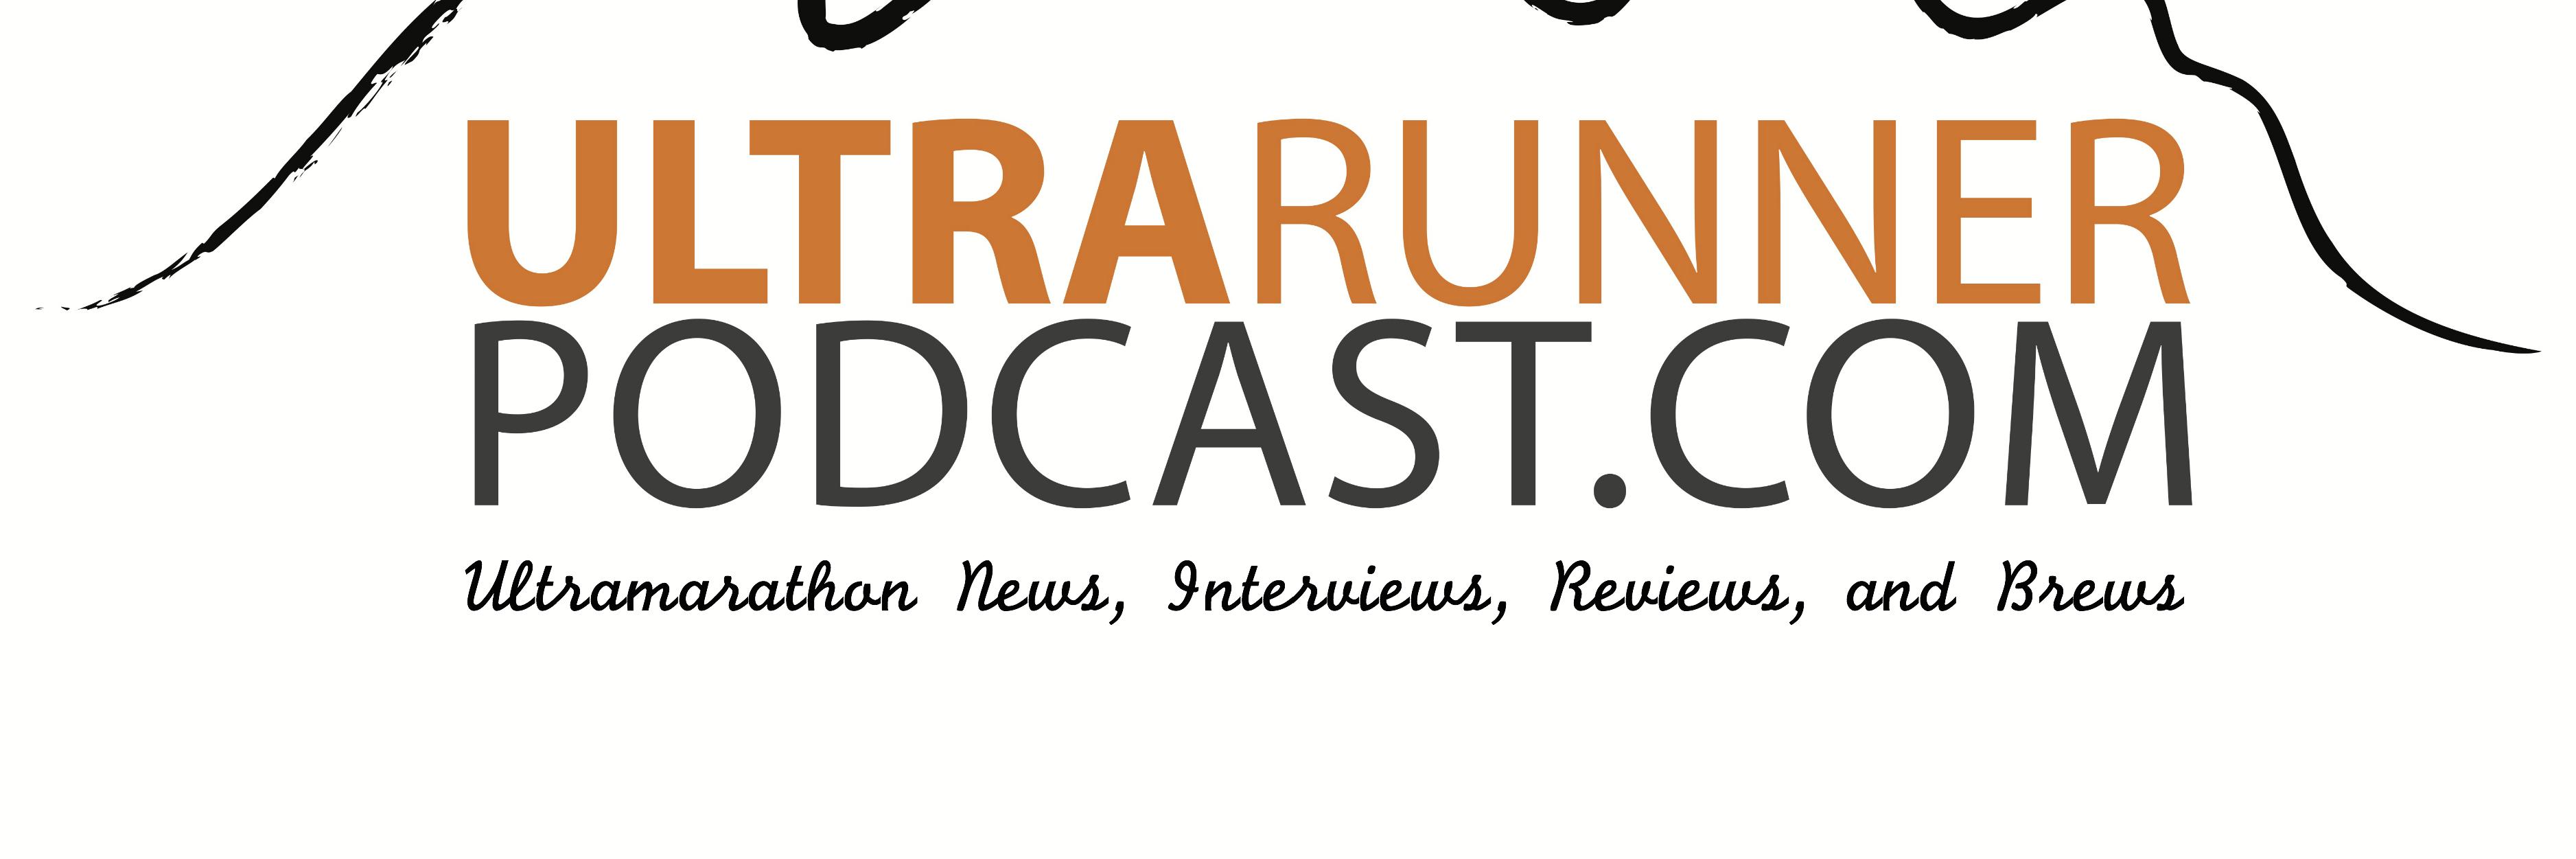 Ultramarathon Daily News | Thursday, June 4 via UltraRunnerPodcast.com | UltraRunnerPodcast.com: Friends, I'm tak… twitter.com/i/web/status/1…